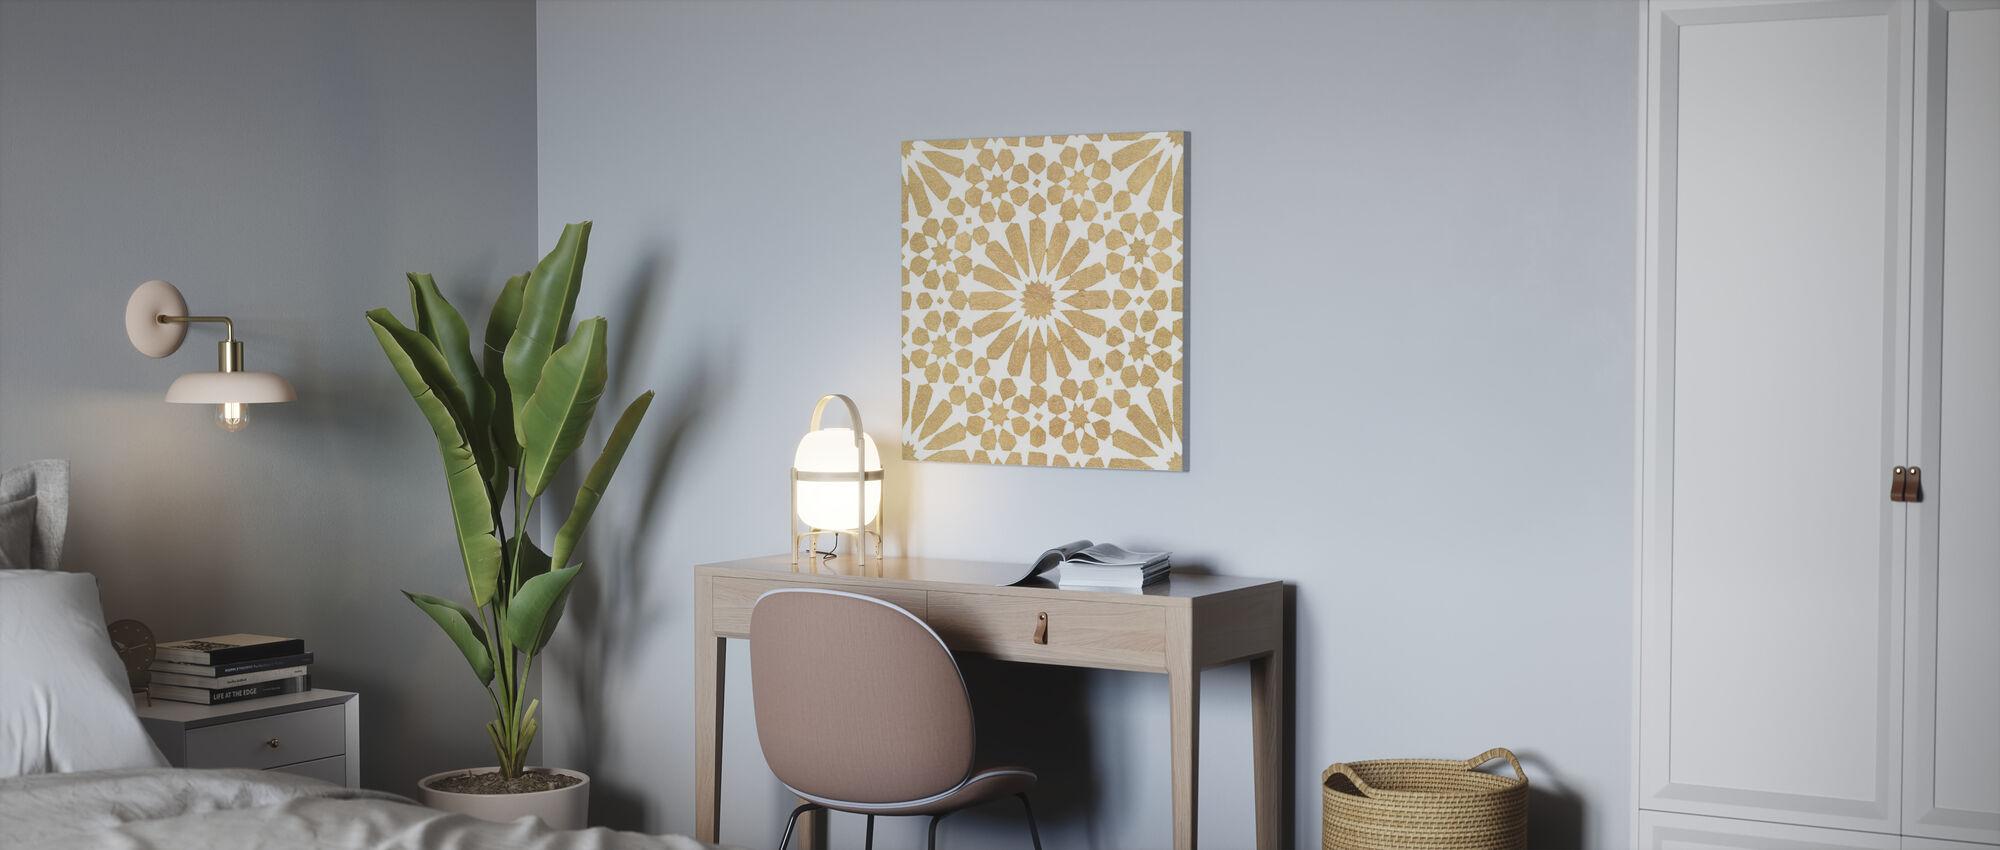 Simply Elegant II - Canvas print - Office